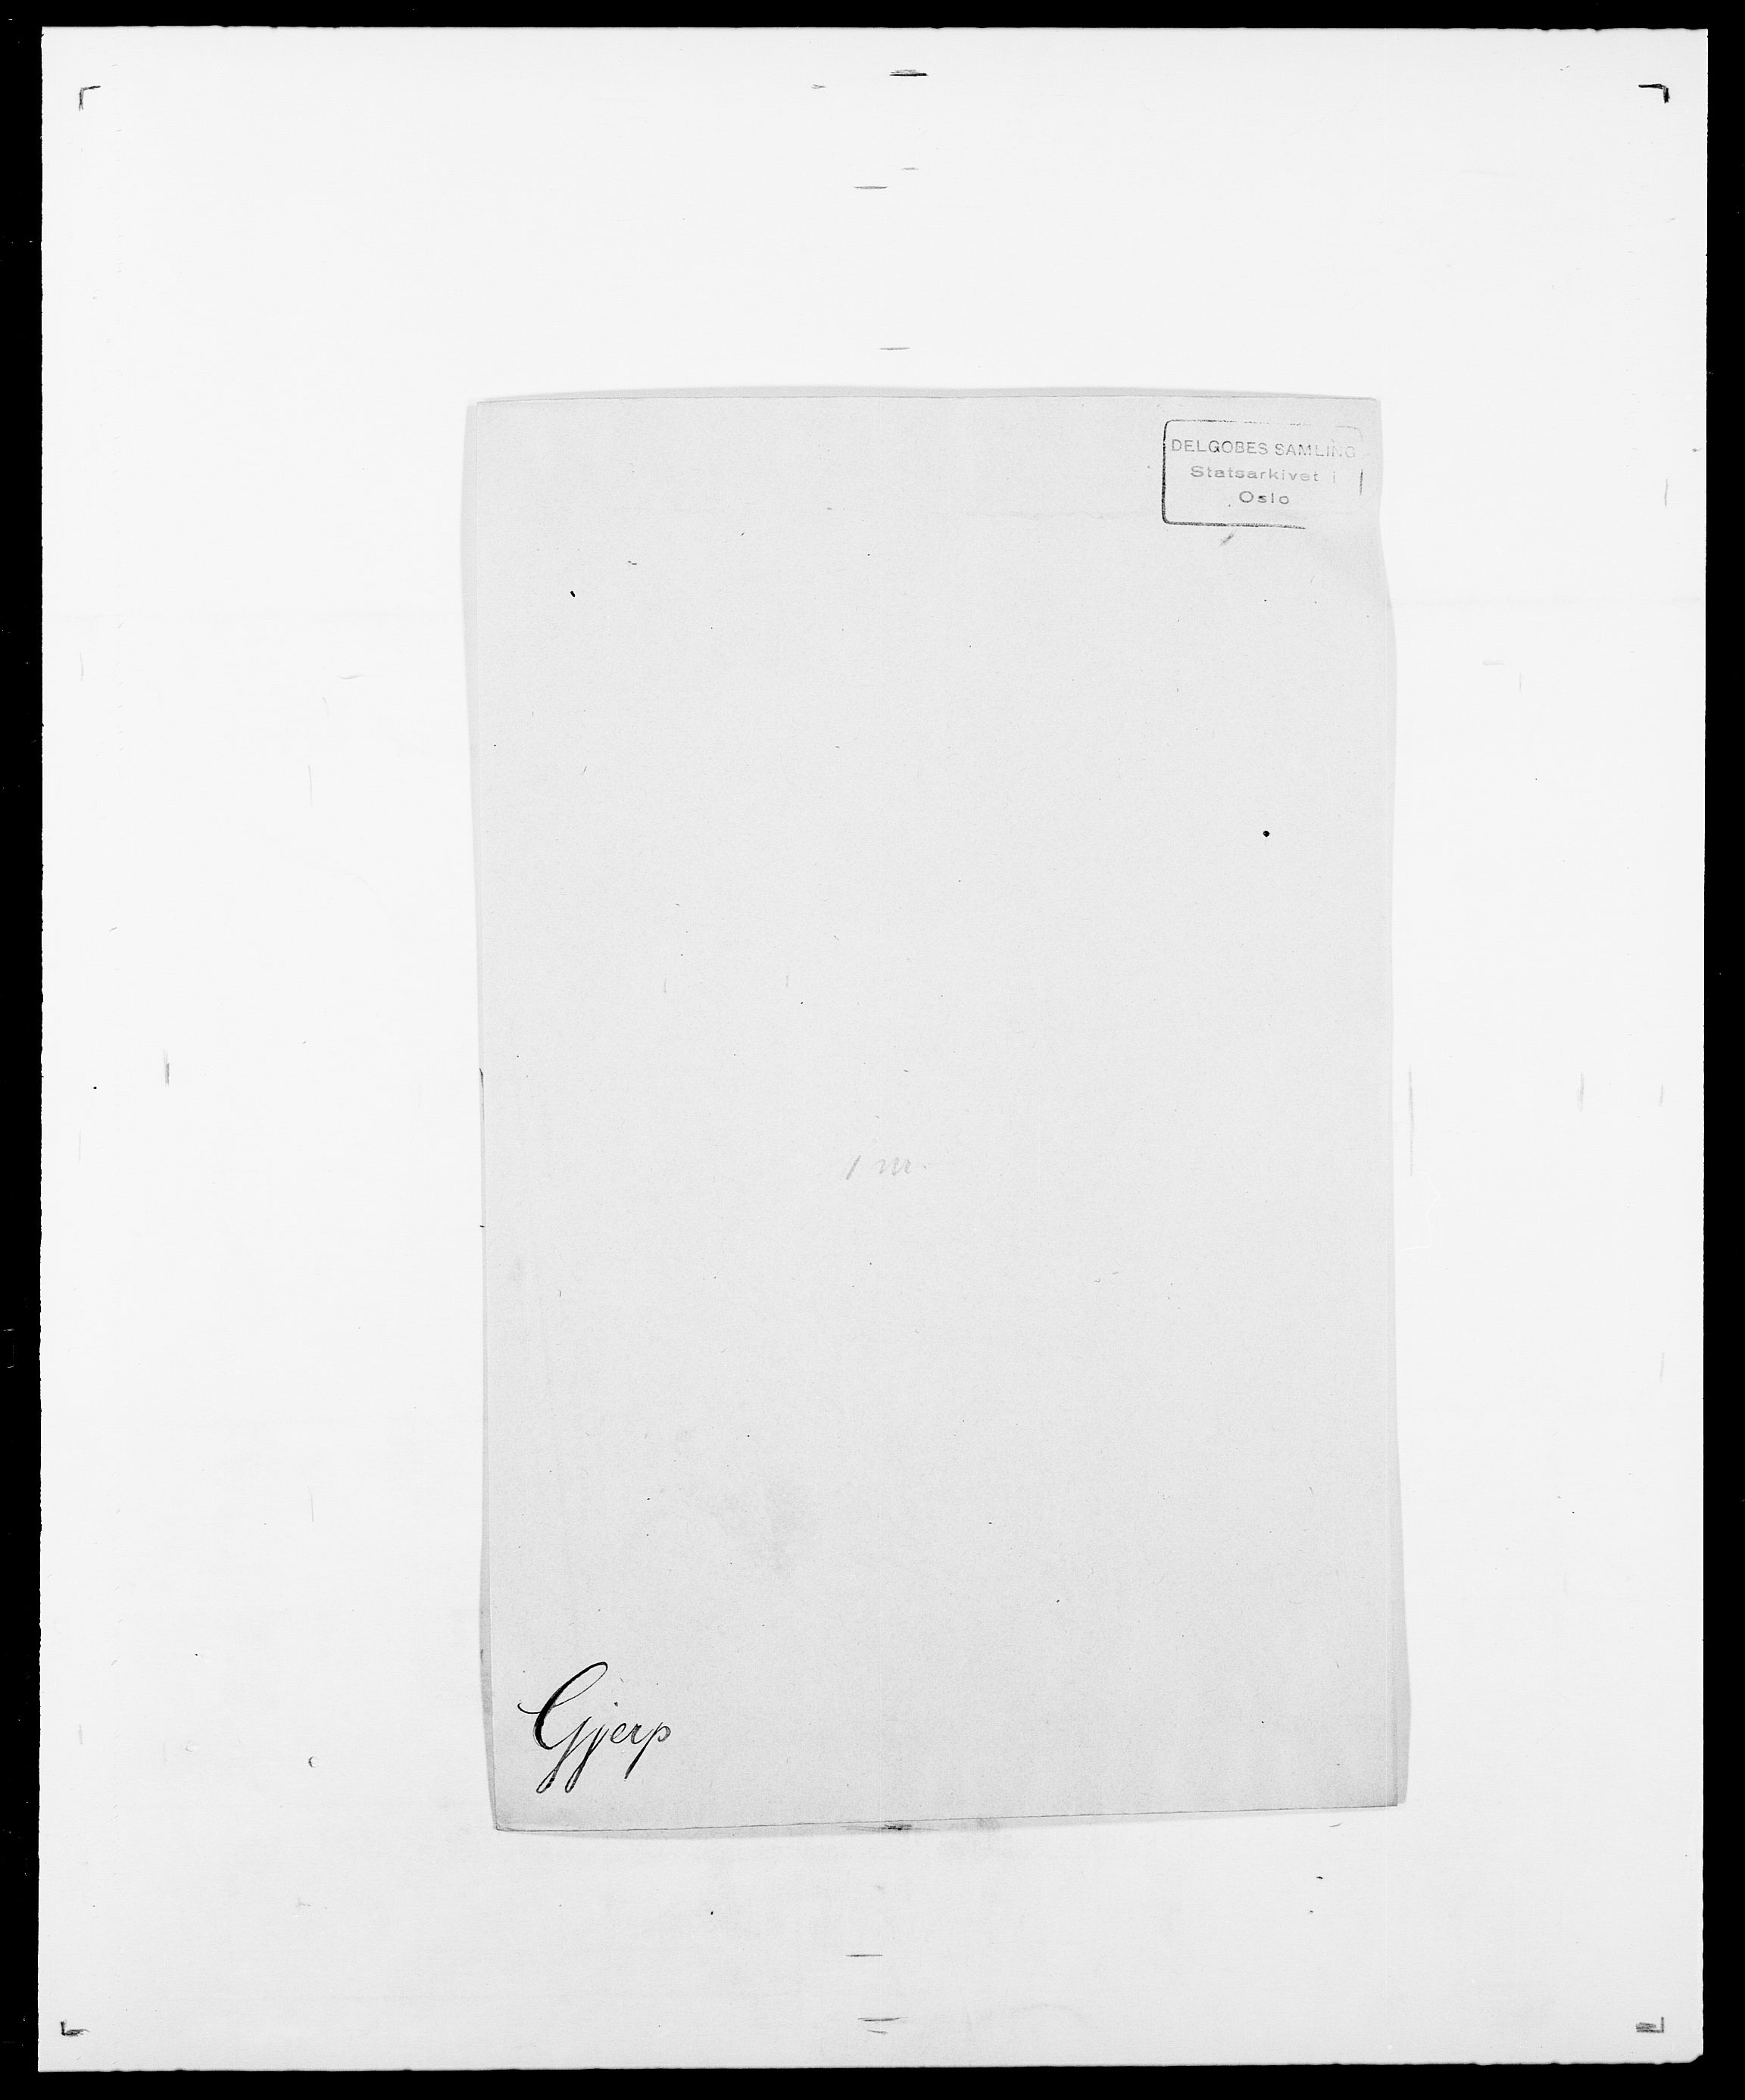 SAO, Delgobe, Charles Antoine - samling, D/Da/L0014: Giebdhausen - Grip, s. 148